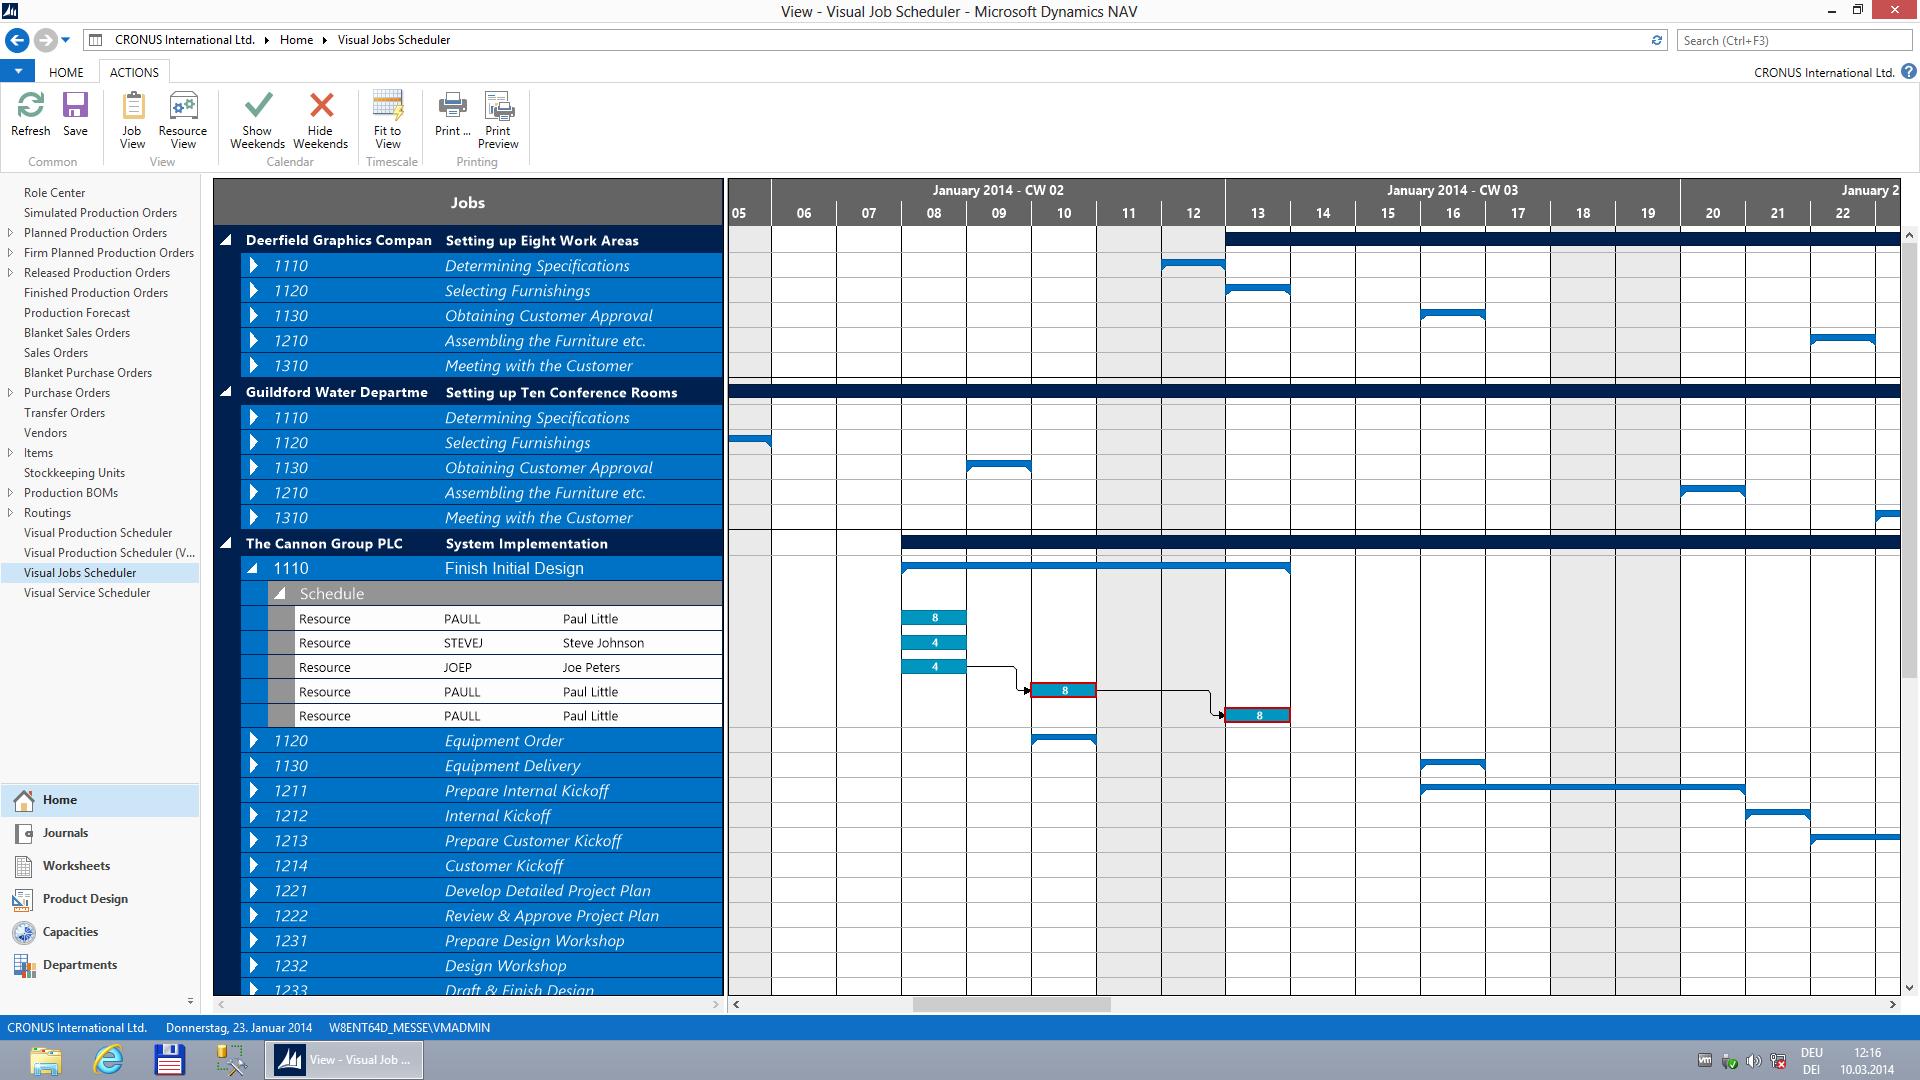 2014-03_Screenshot_NETRONIC_Visual_Jobs_Scheduler_Add-in_for_Microsoft_Dynamics_NAV_Jobs_View